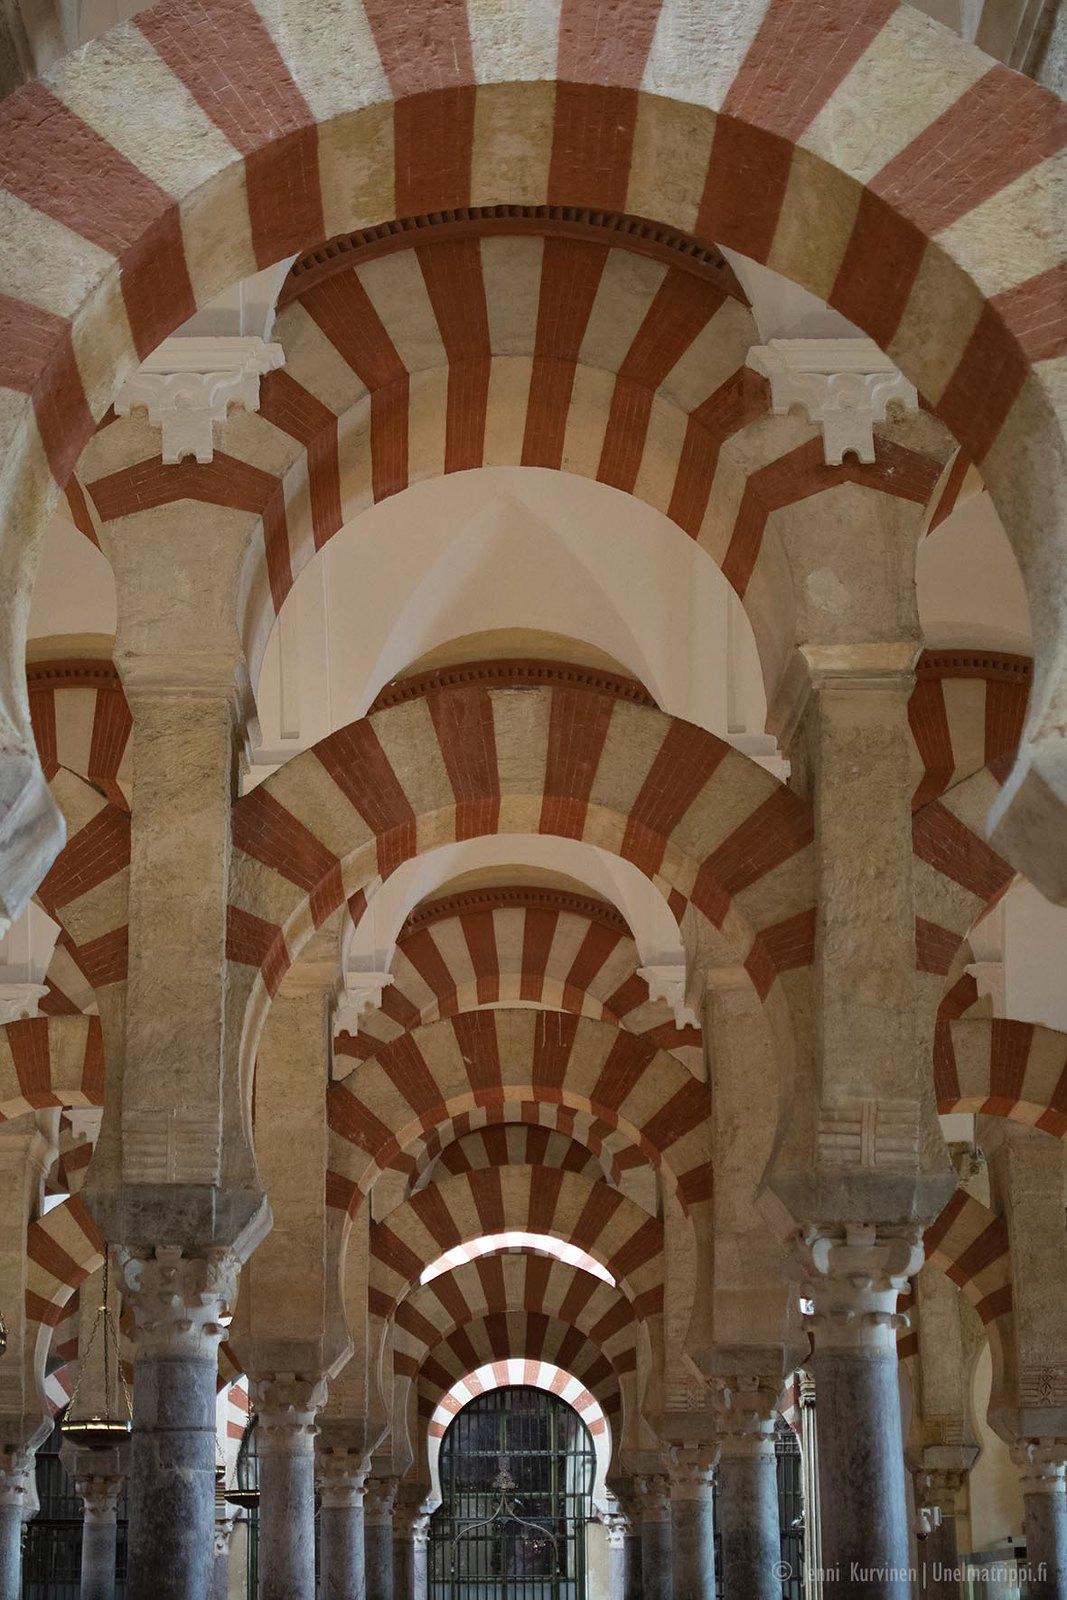 20190210-Unelmatrippi-La-Mezquita-Cordoba-DSC0259